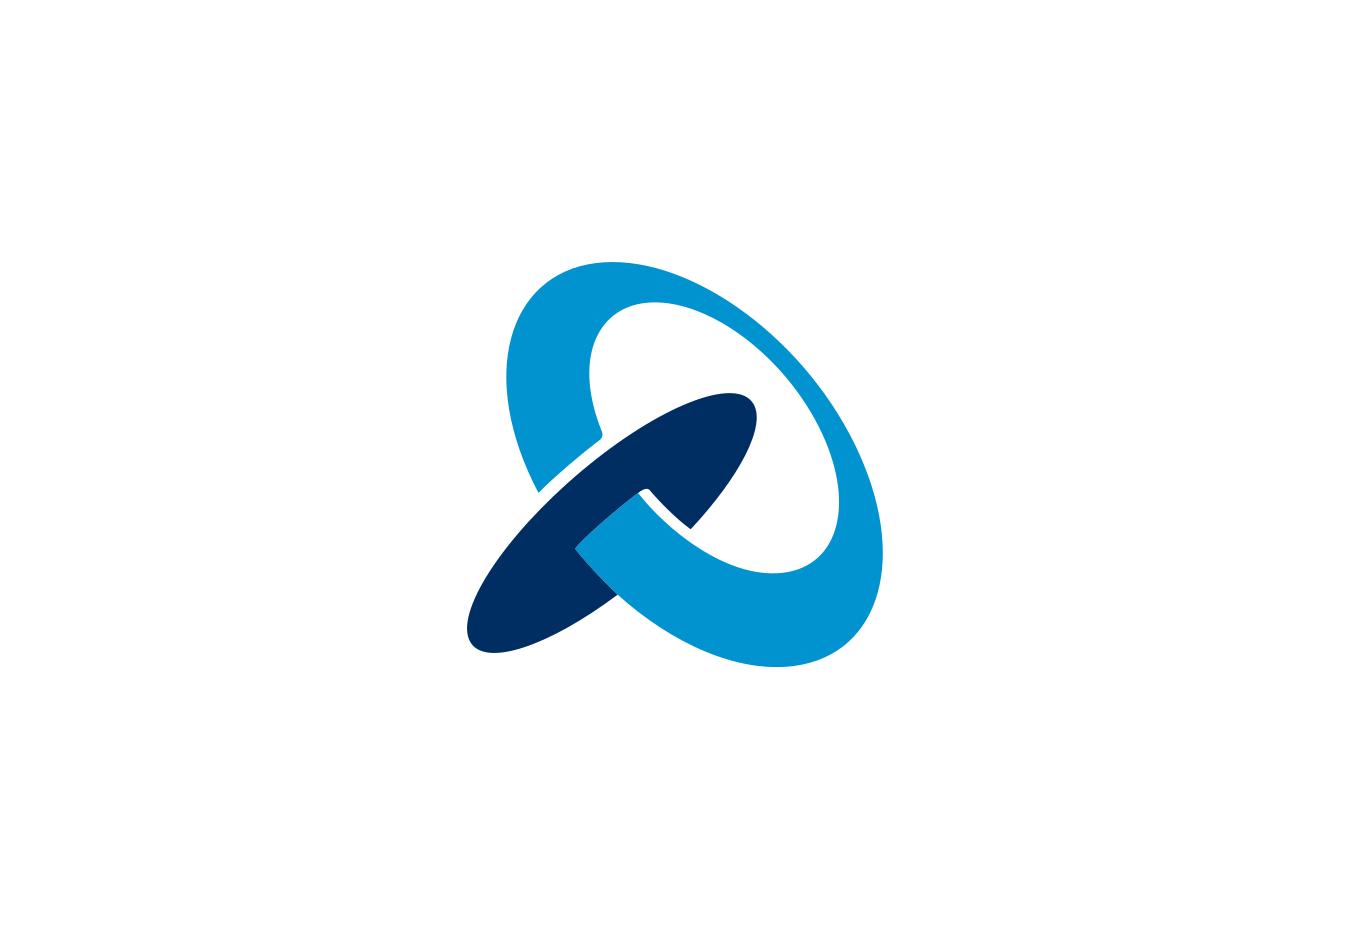 Orica logo.